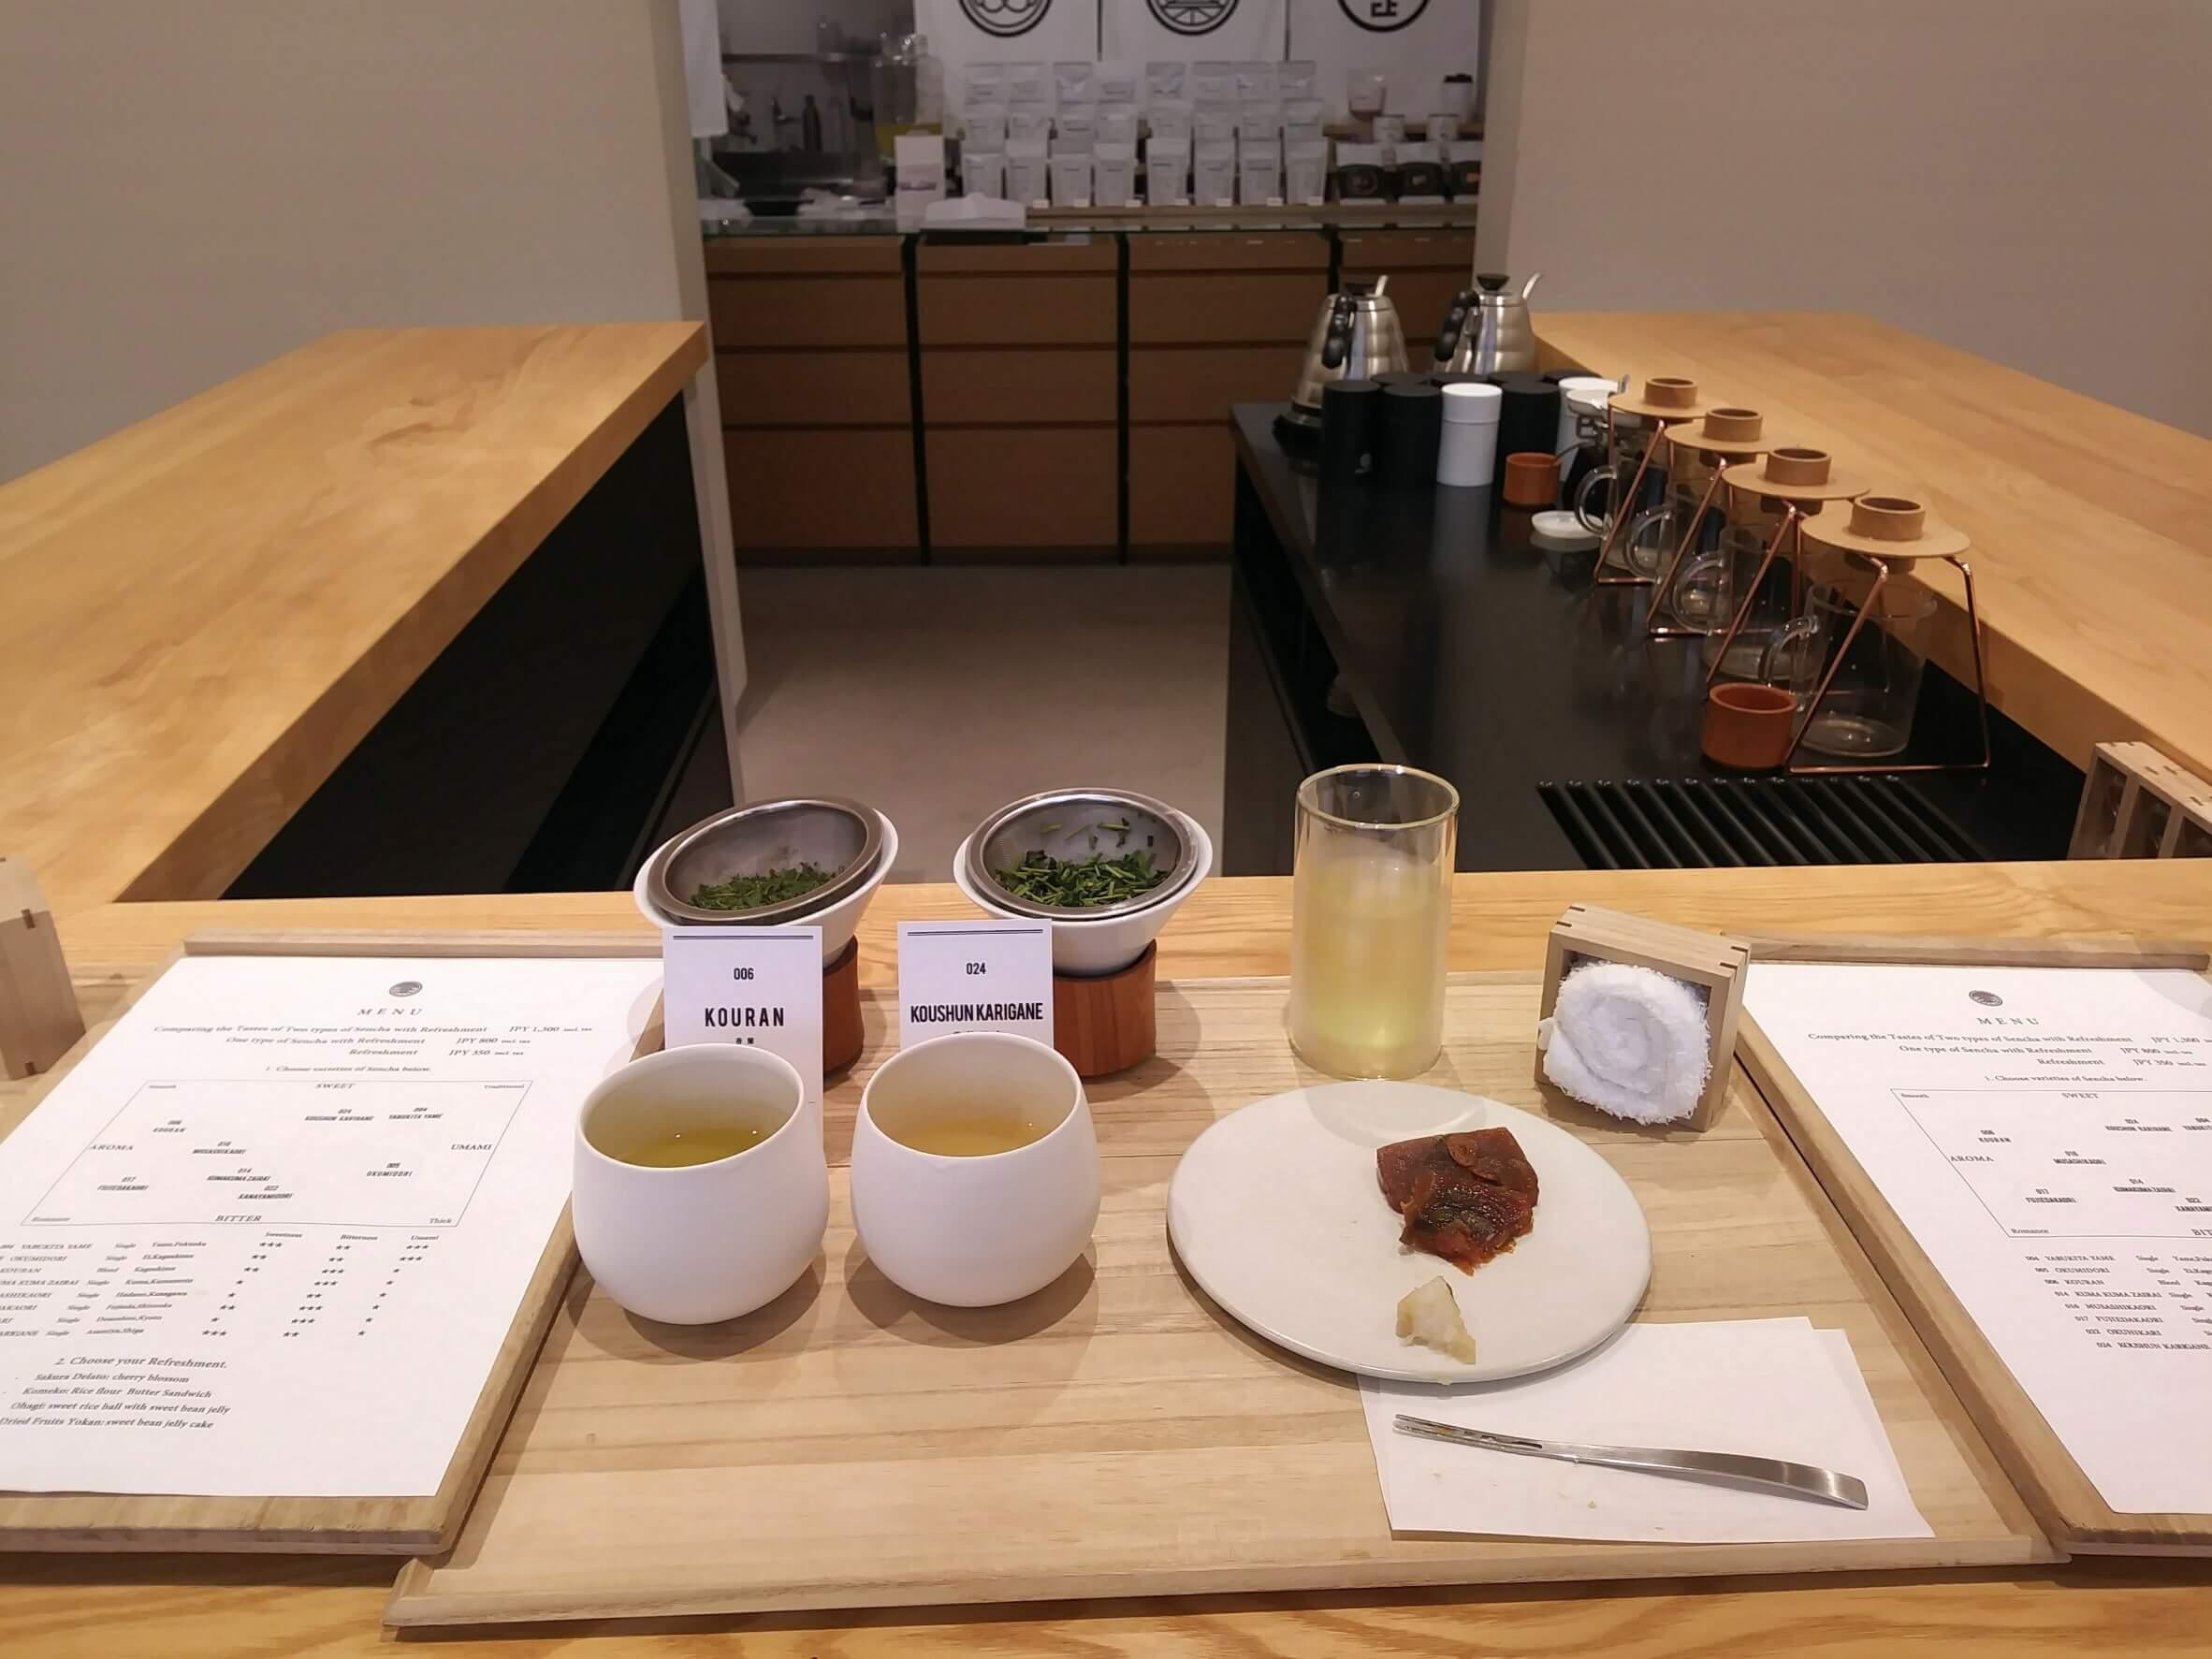 Photo of 留学生と日本発見シリーズ:日本茶の新発見 すてきな出会いがあるかも「東京茶寮」